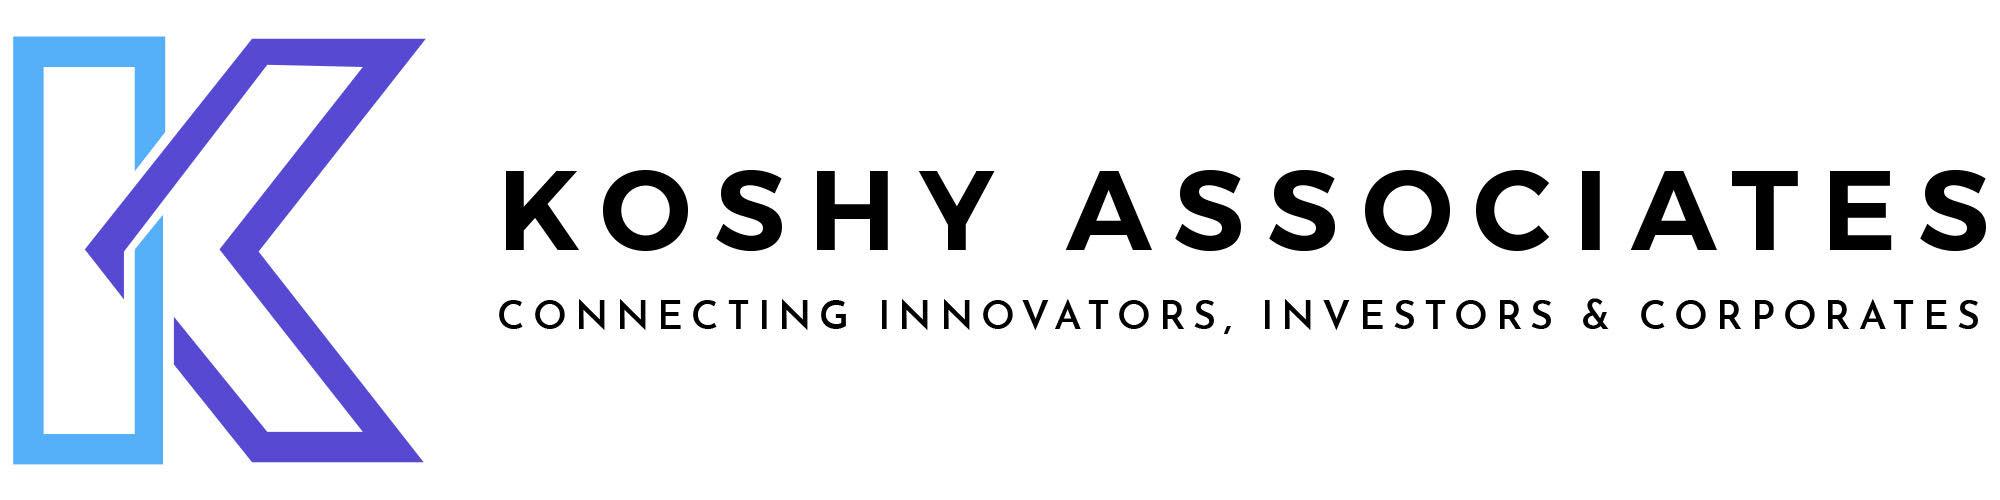 Koshy Associates logo